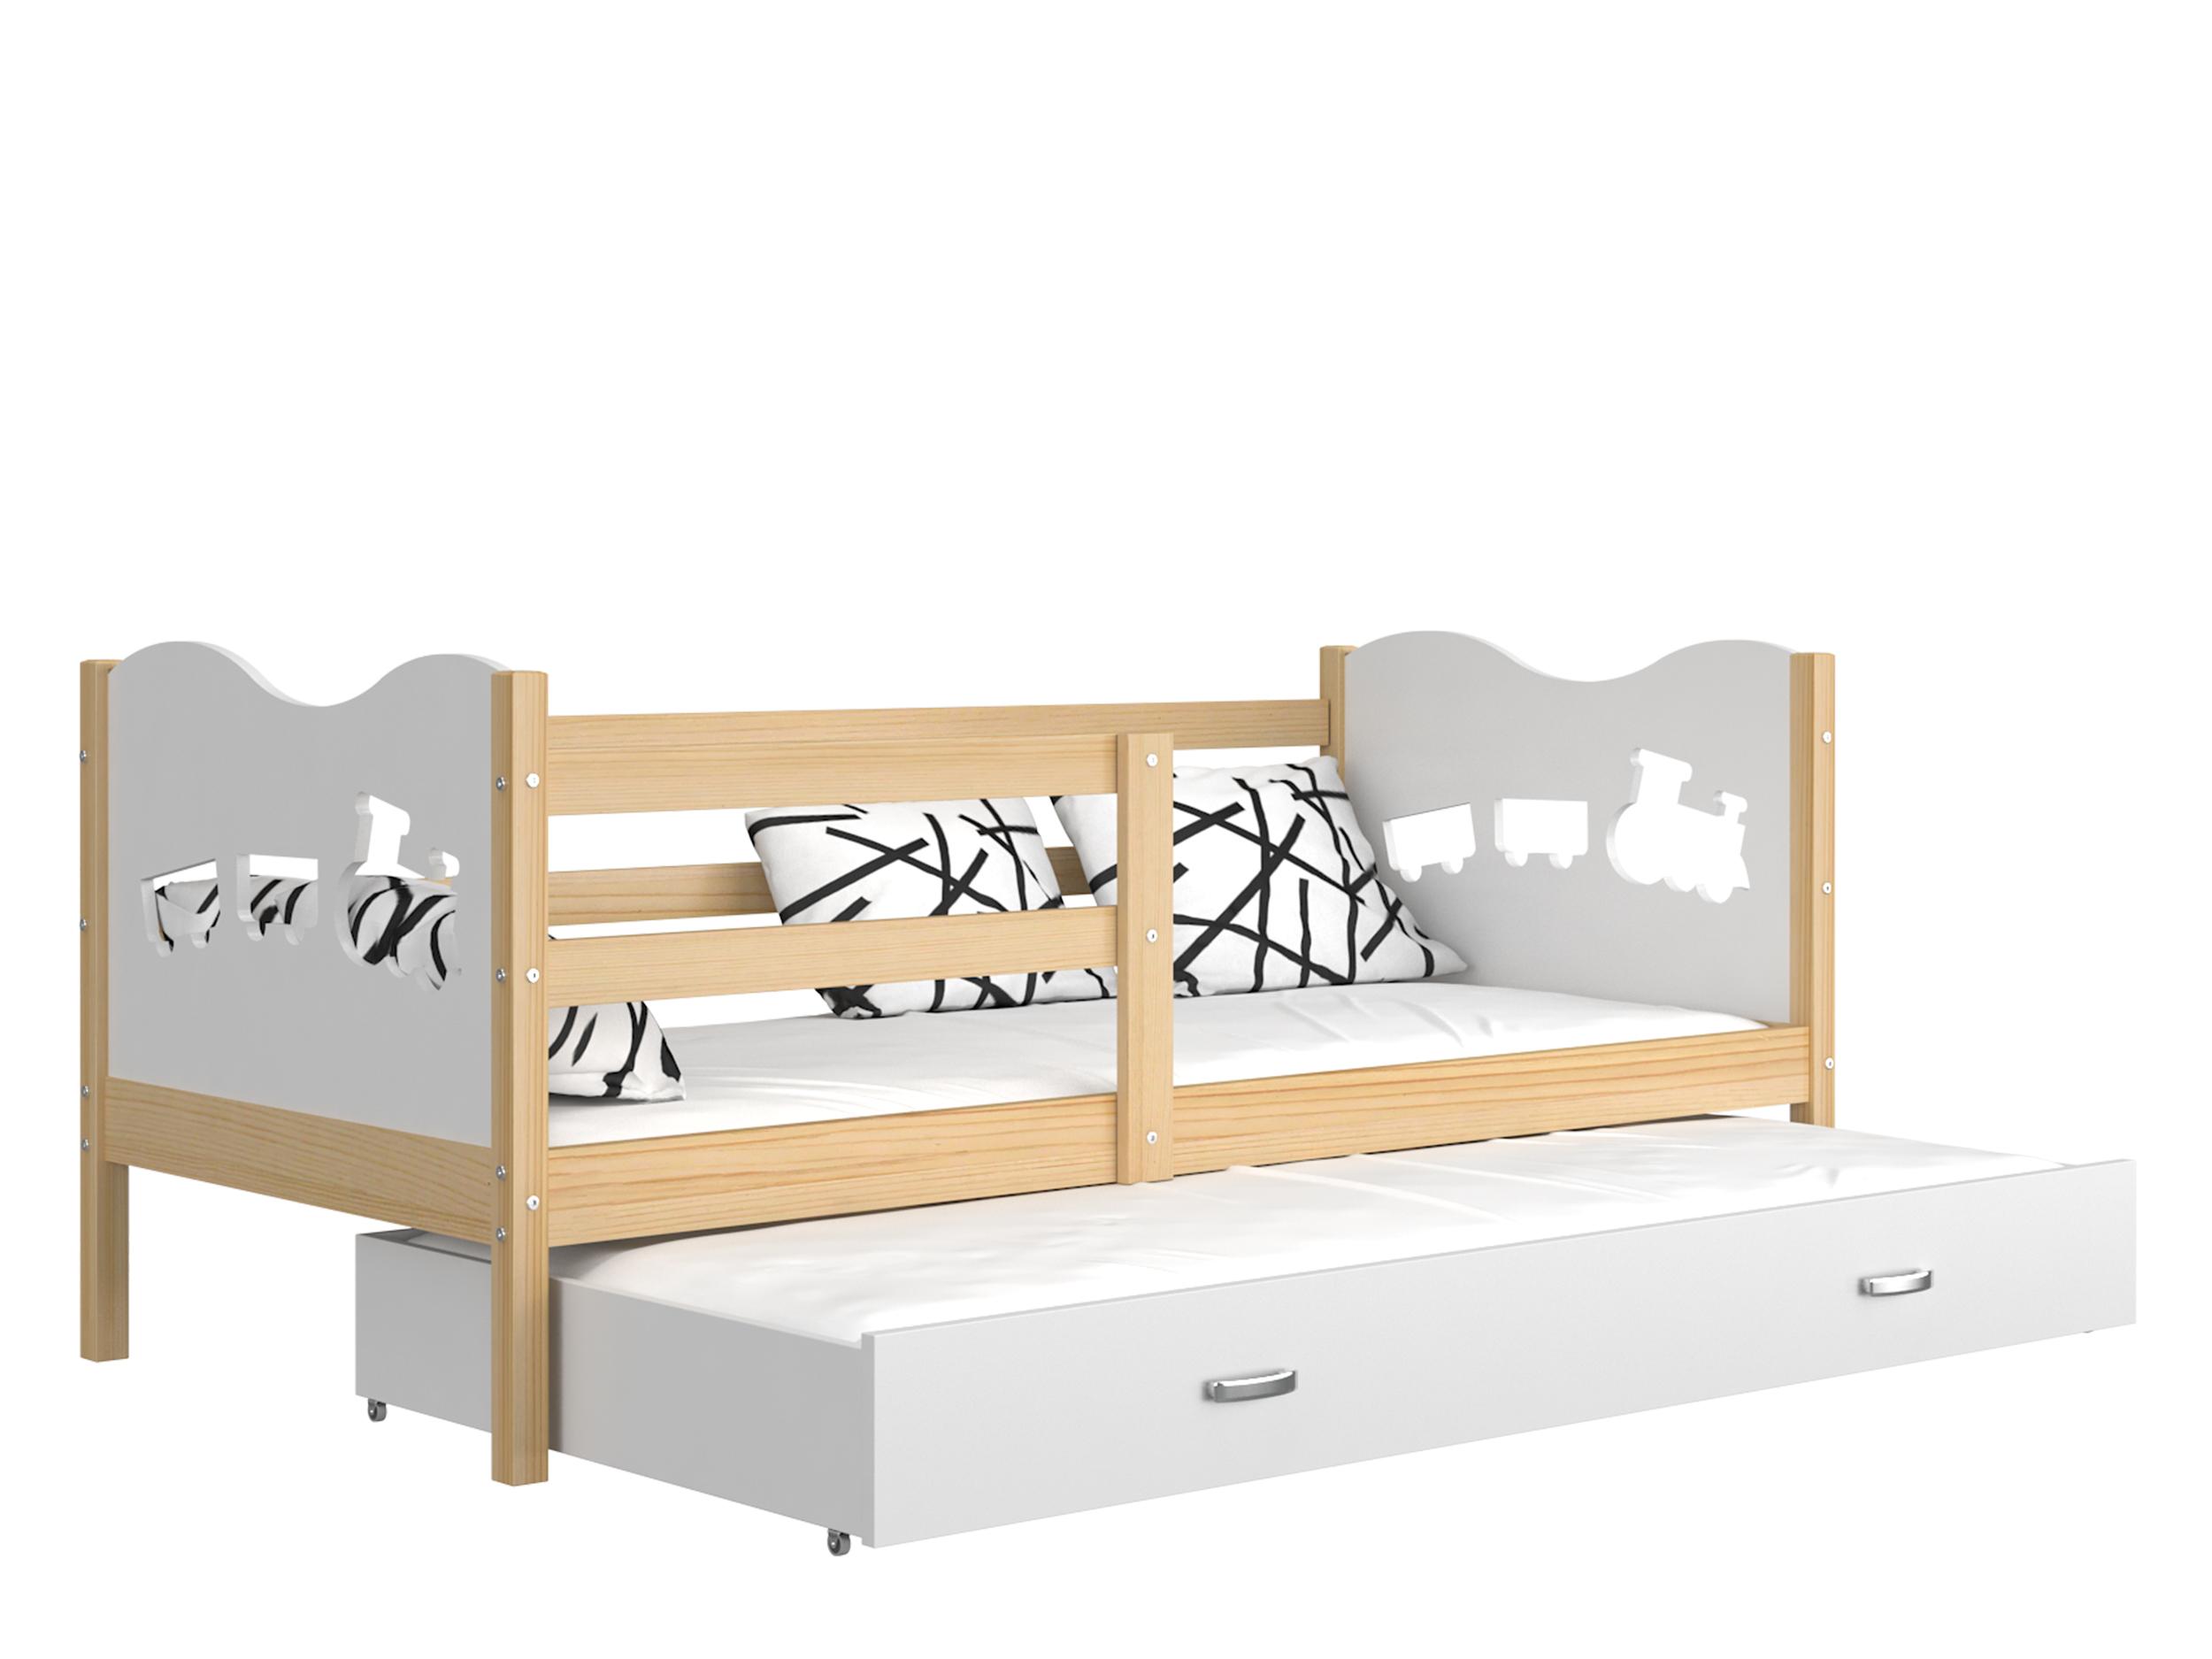 ArtAJ Detská posteľ Max P2 drevo / MDF 190 x 80 cm Max: borovica / biela s matracom 190 x 80 cm